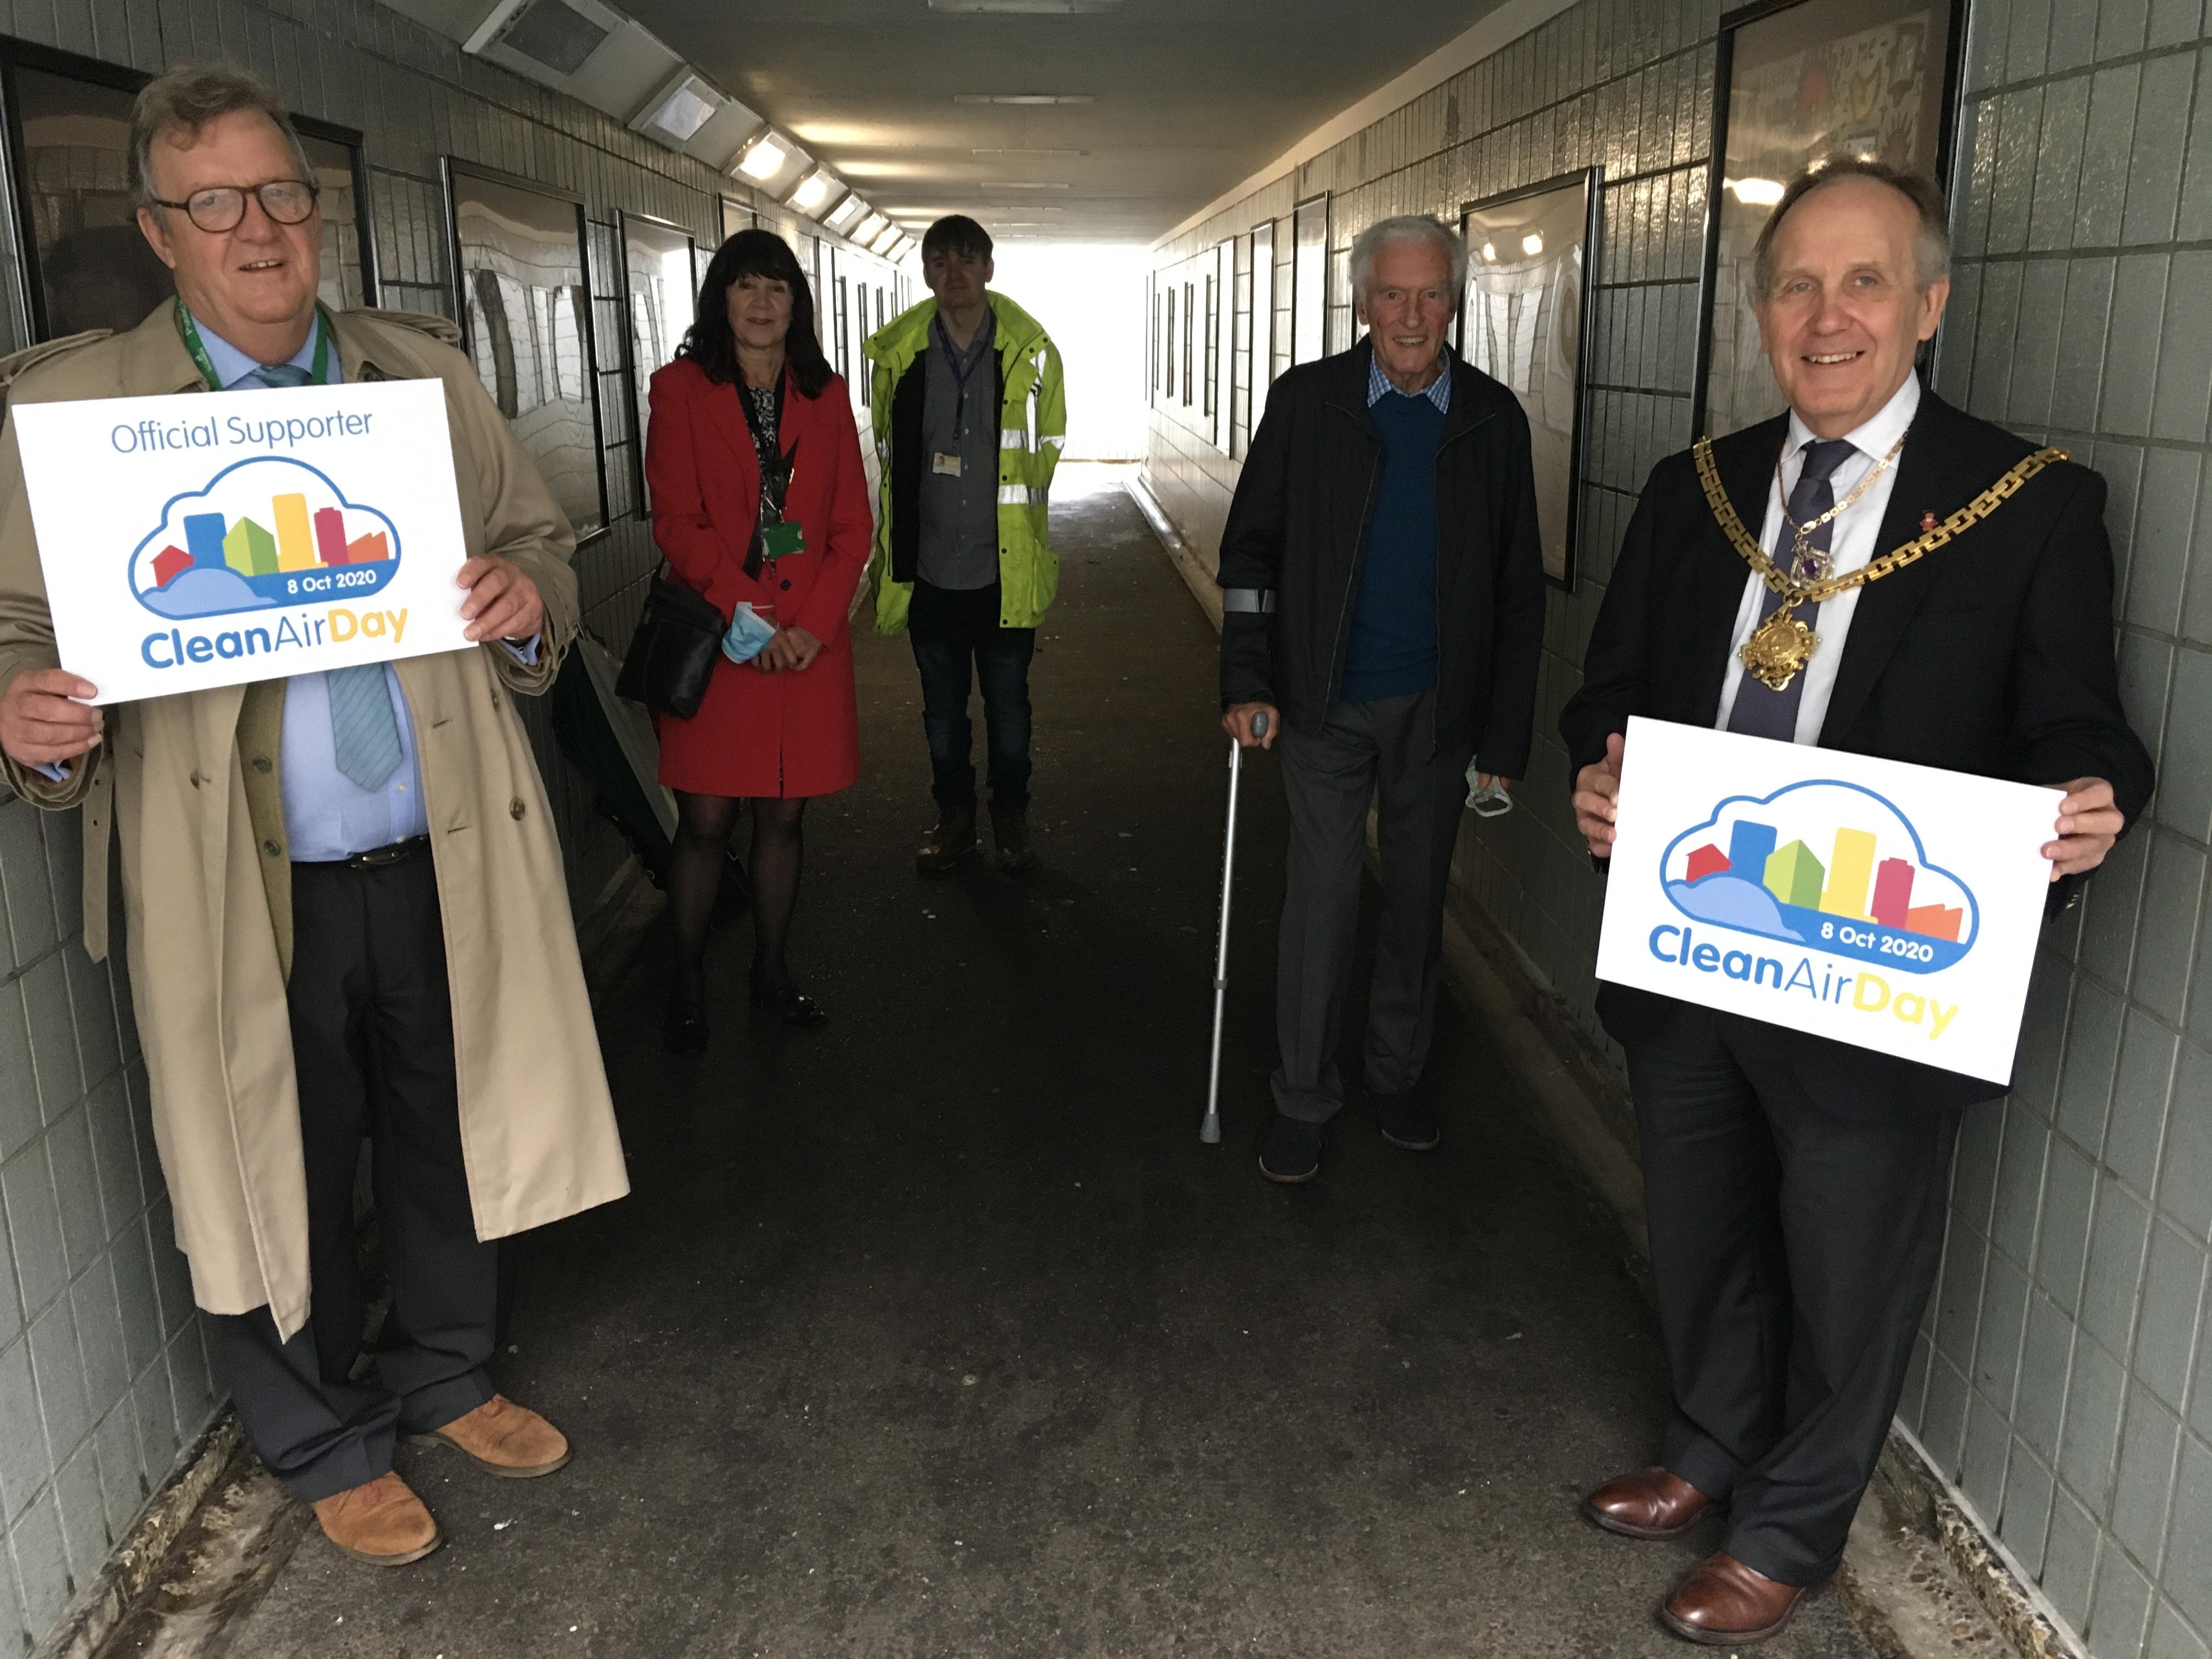 London Road Subway - Geoff Bennett Cllr Hutchings Cllr Deering